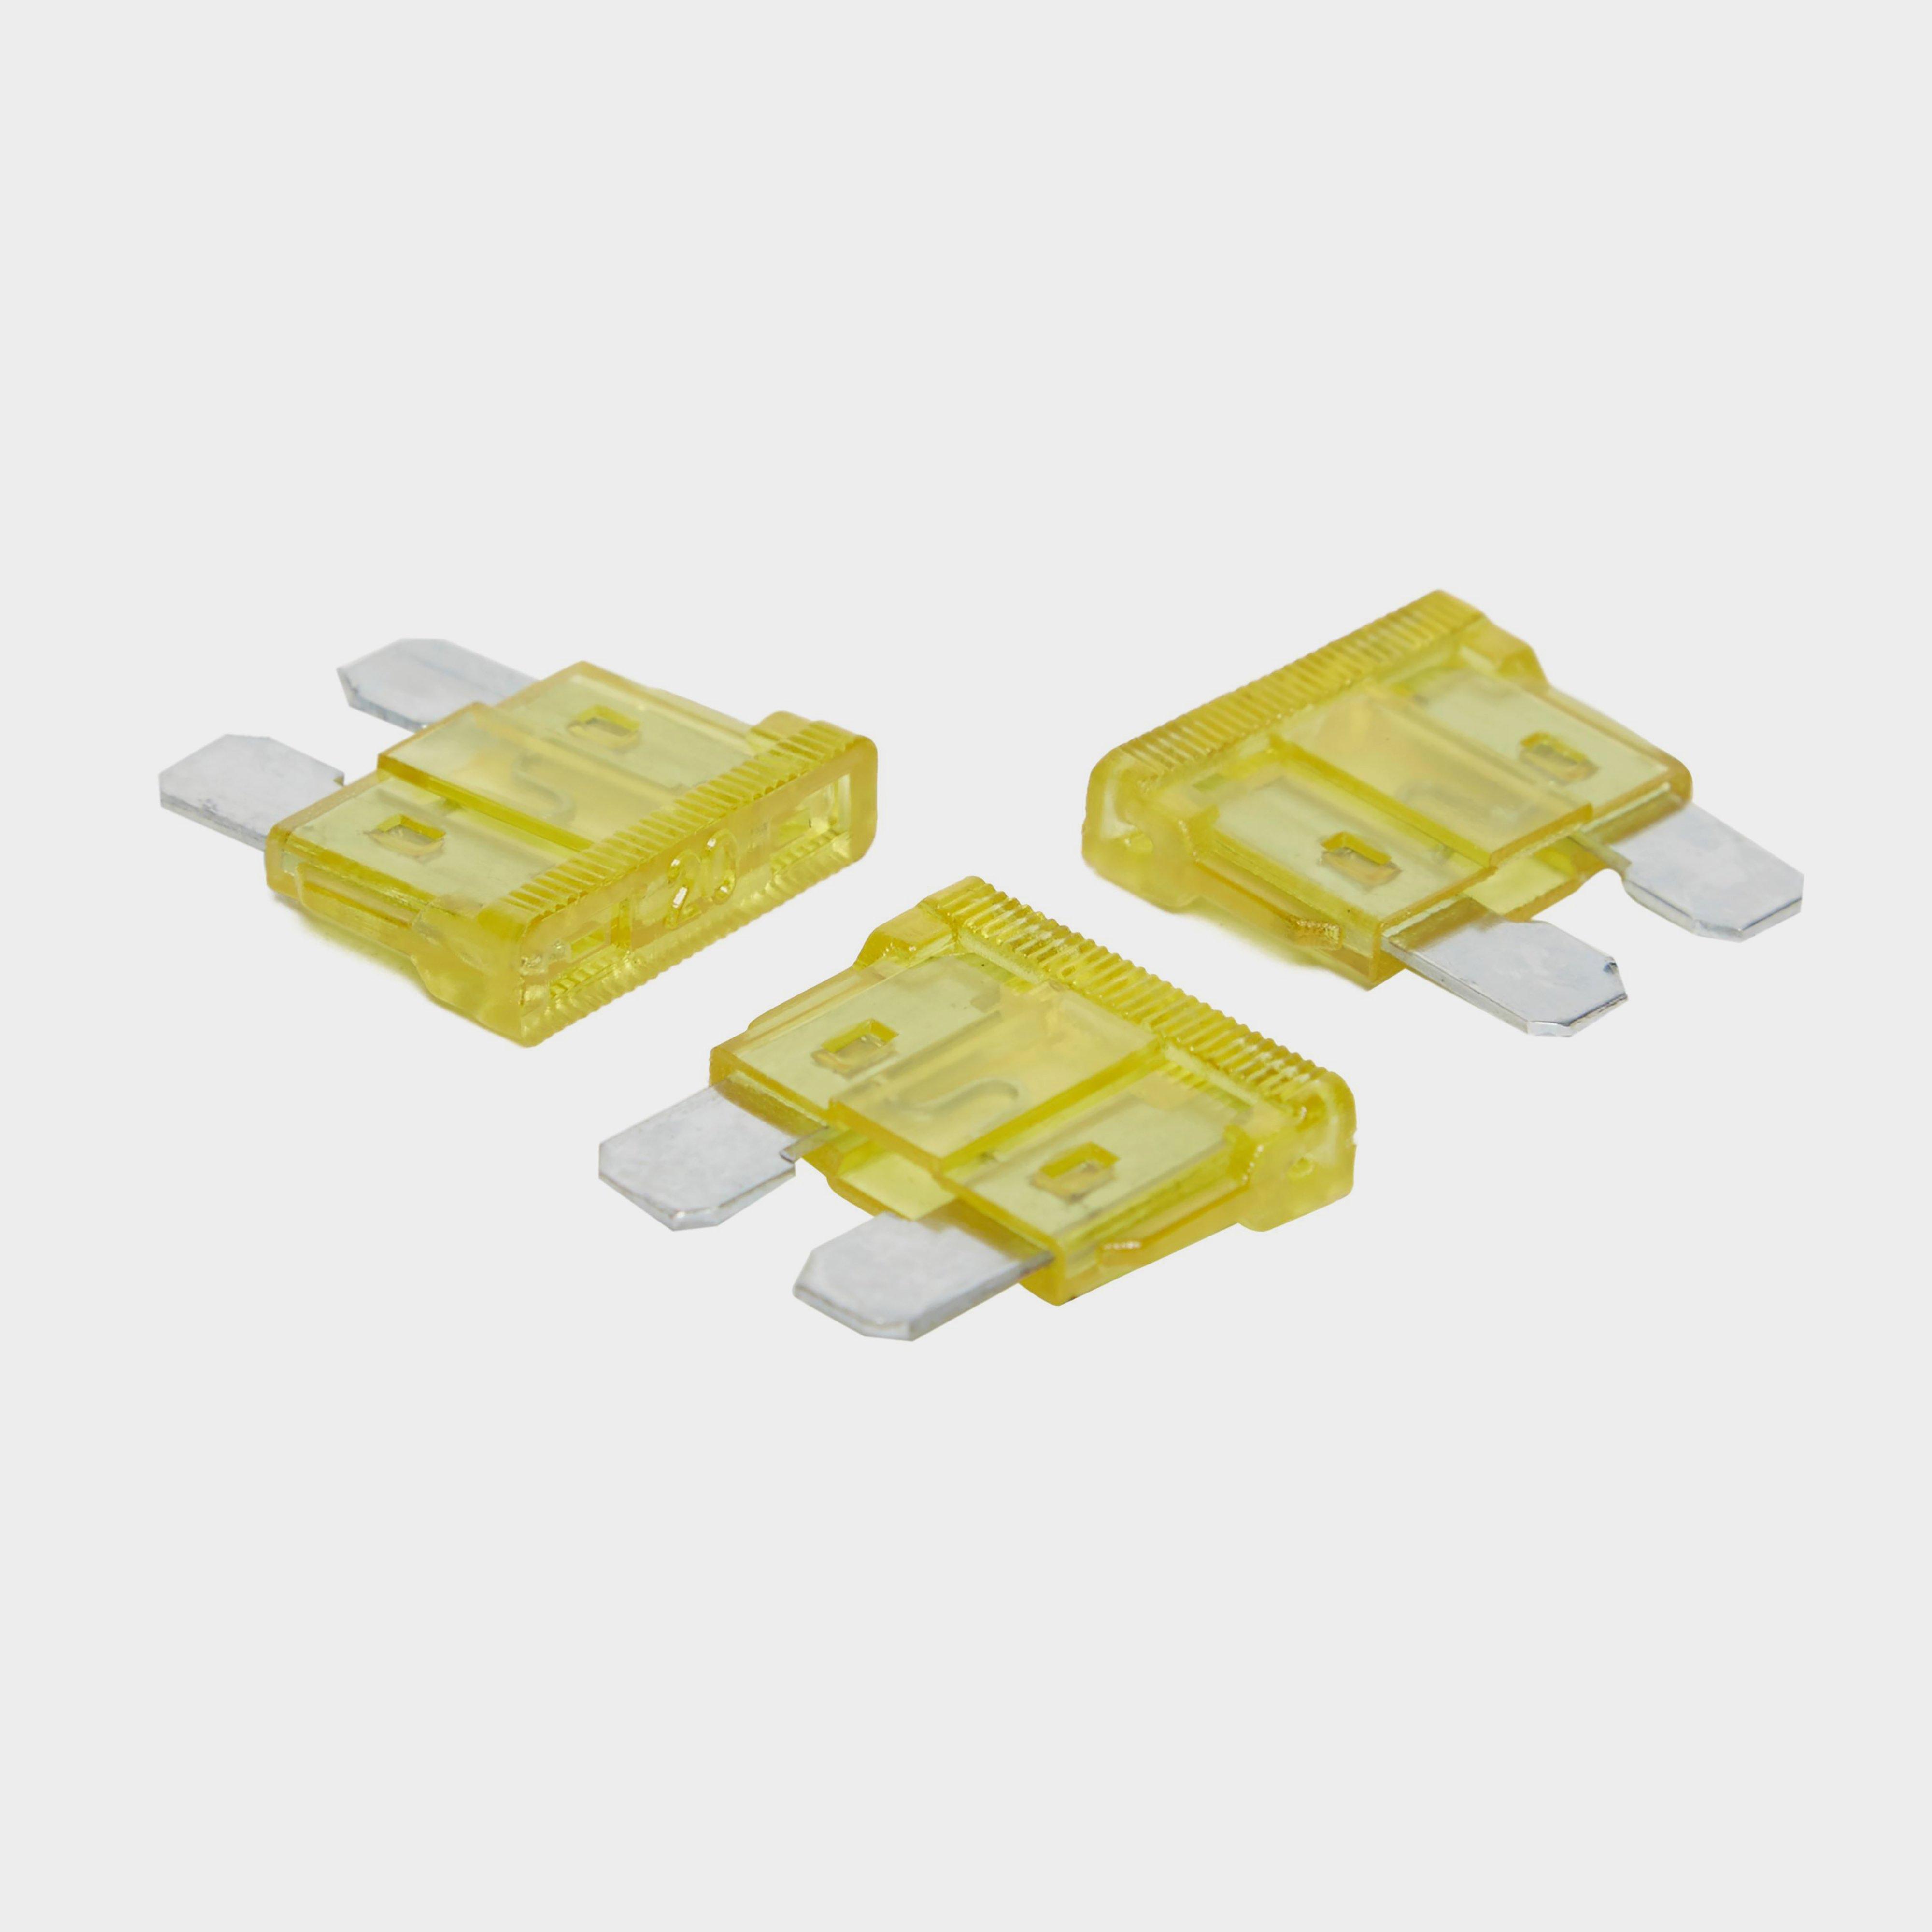 w4 20 amp blade fuses